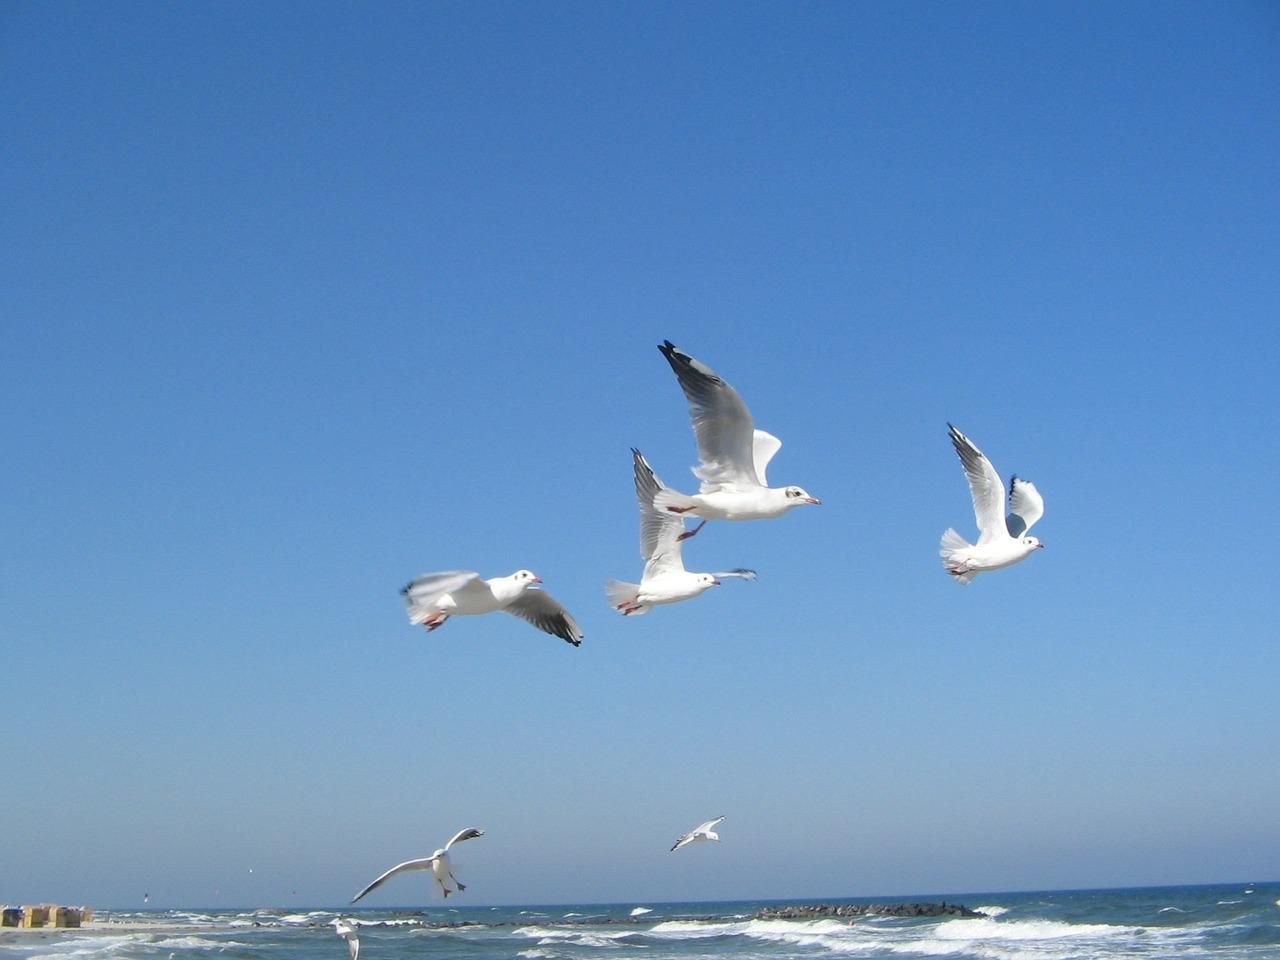 baltic-sea-22521_1280